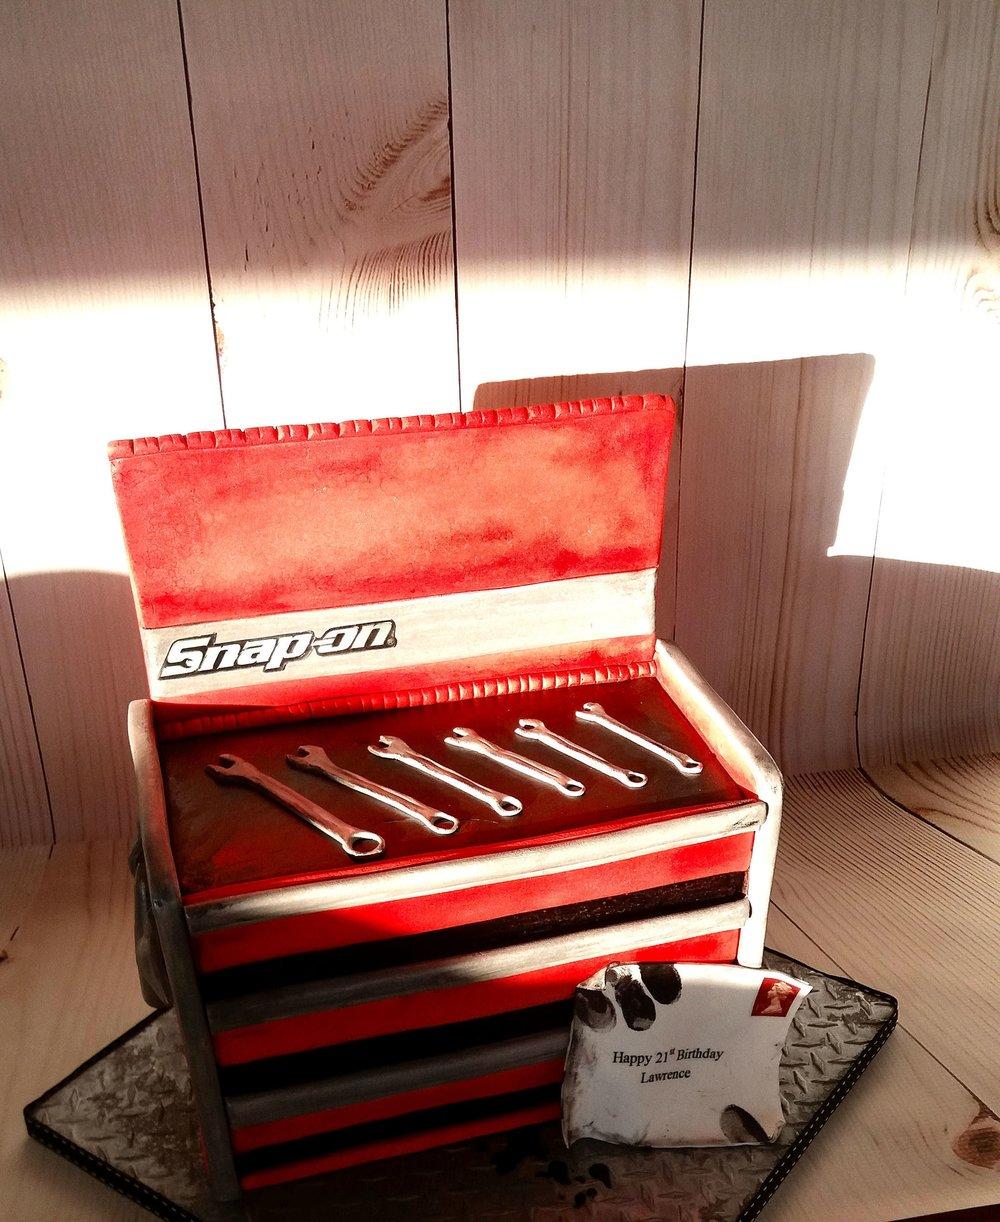 snapon tool box cake.jpg